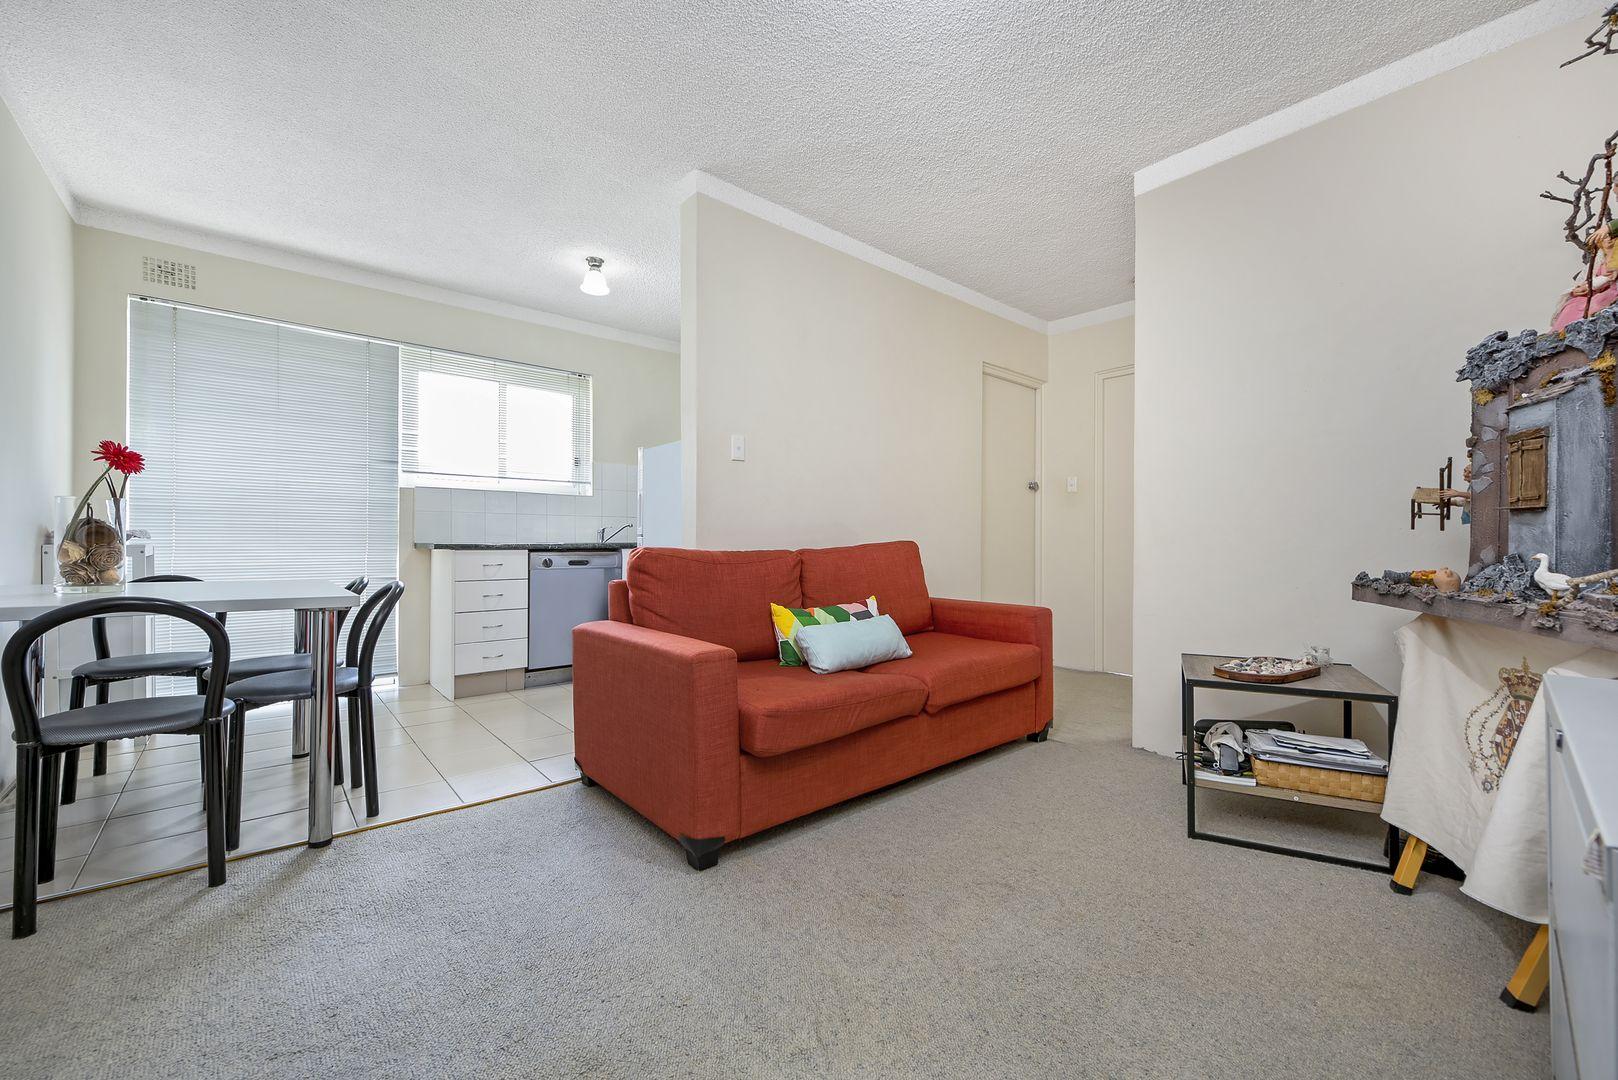 13/24 Chandos Street, Ashfield NSW 2131, Image 1